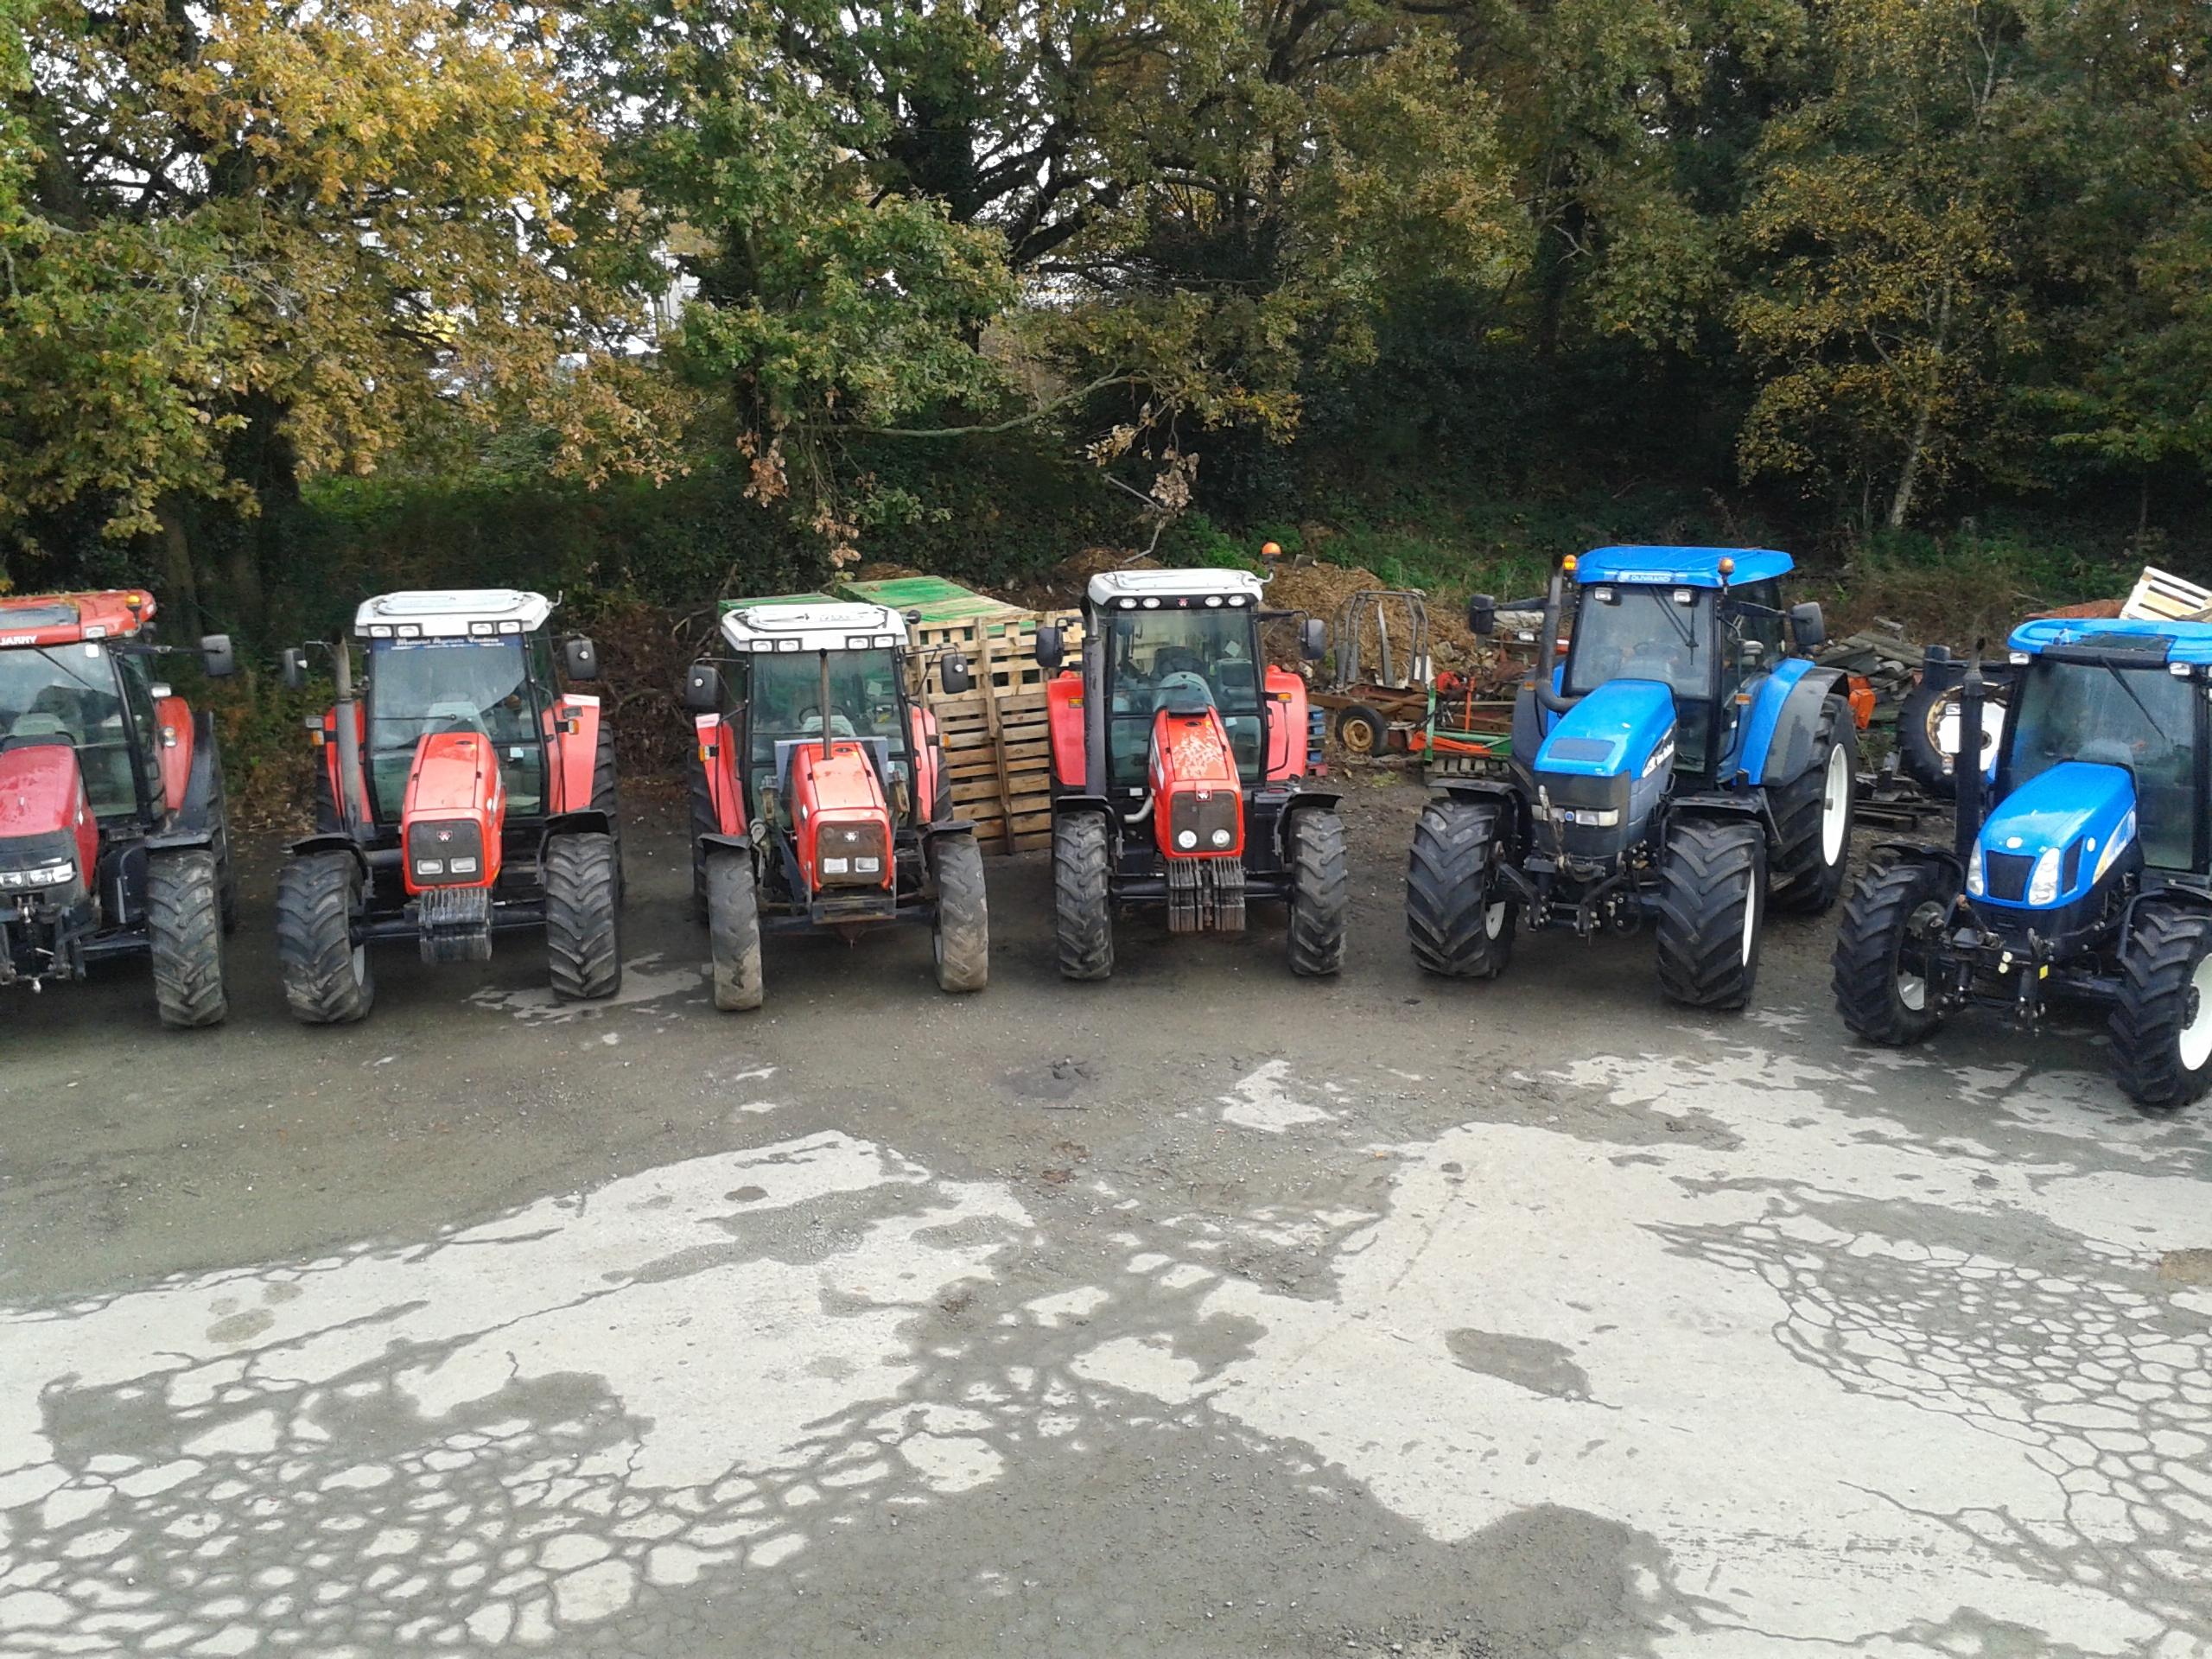 Tracteurs grosse, moyenne puissance